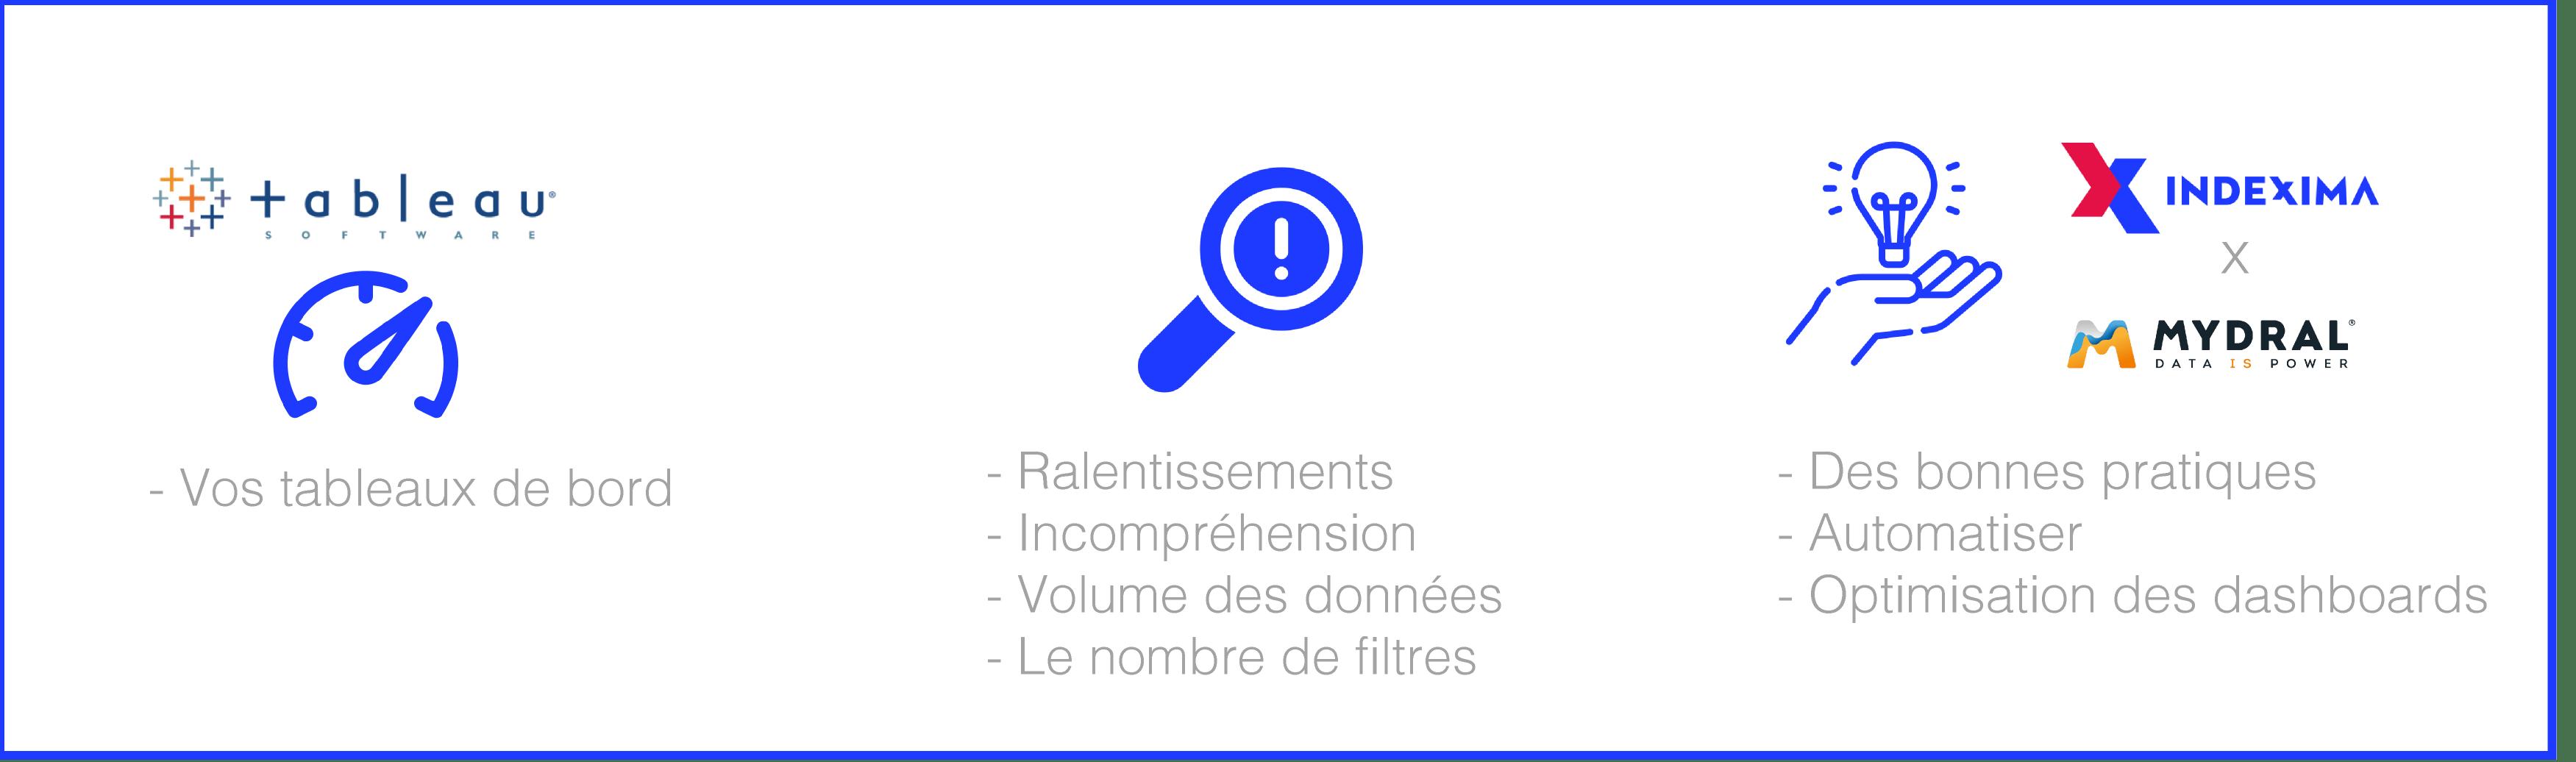 Performance Tableau Indexima